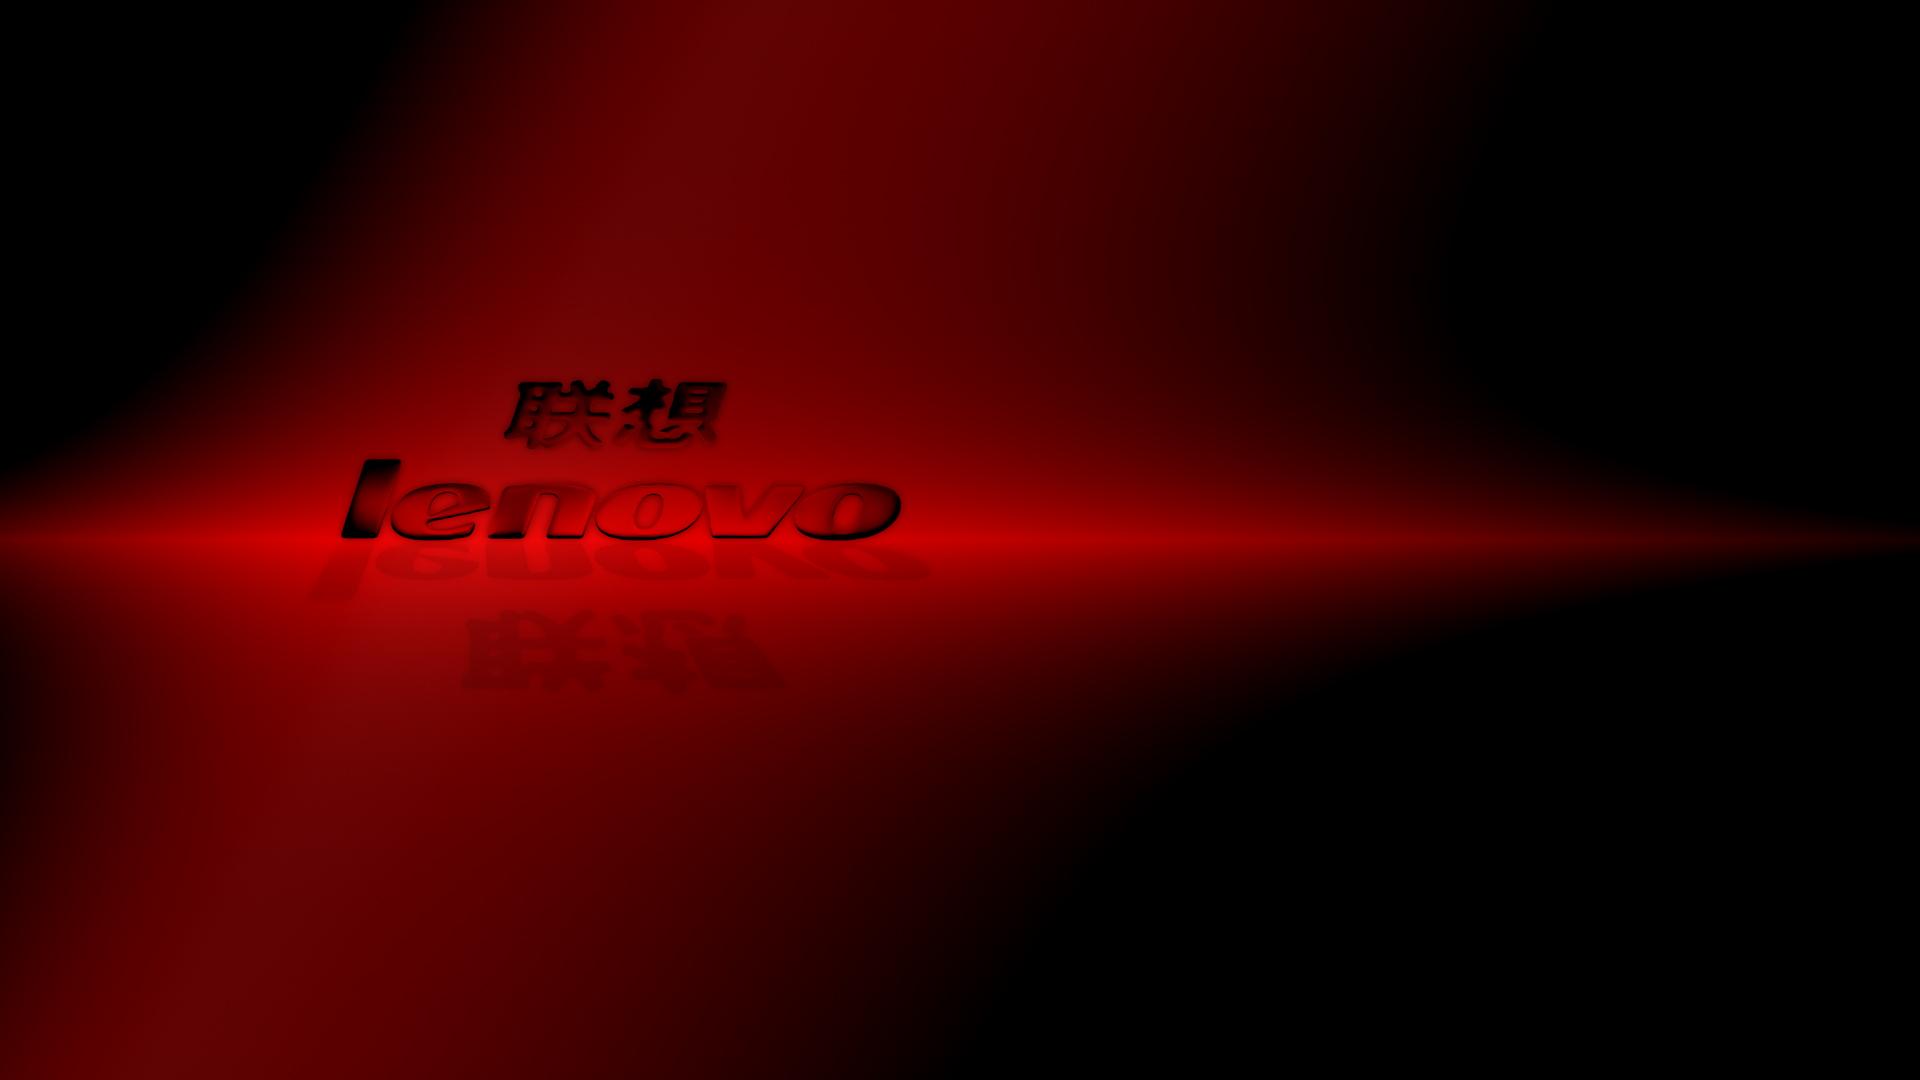 Lenovo Red Wallpaper: Thinkpad Wallpaper HD